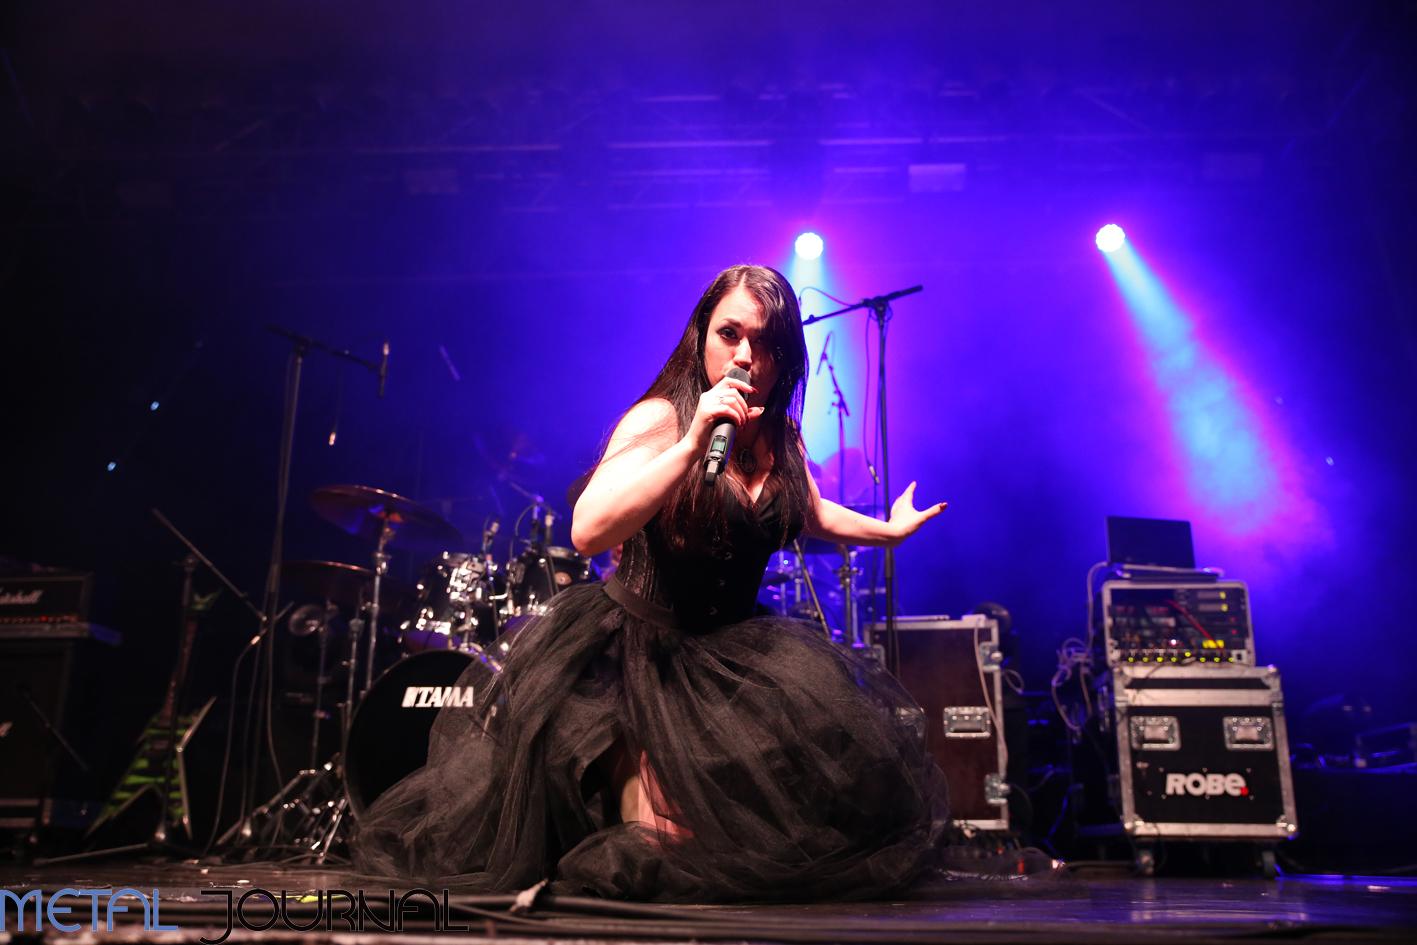 midnight eternal - metal journal bilbao 2018 pic 2